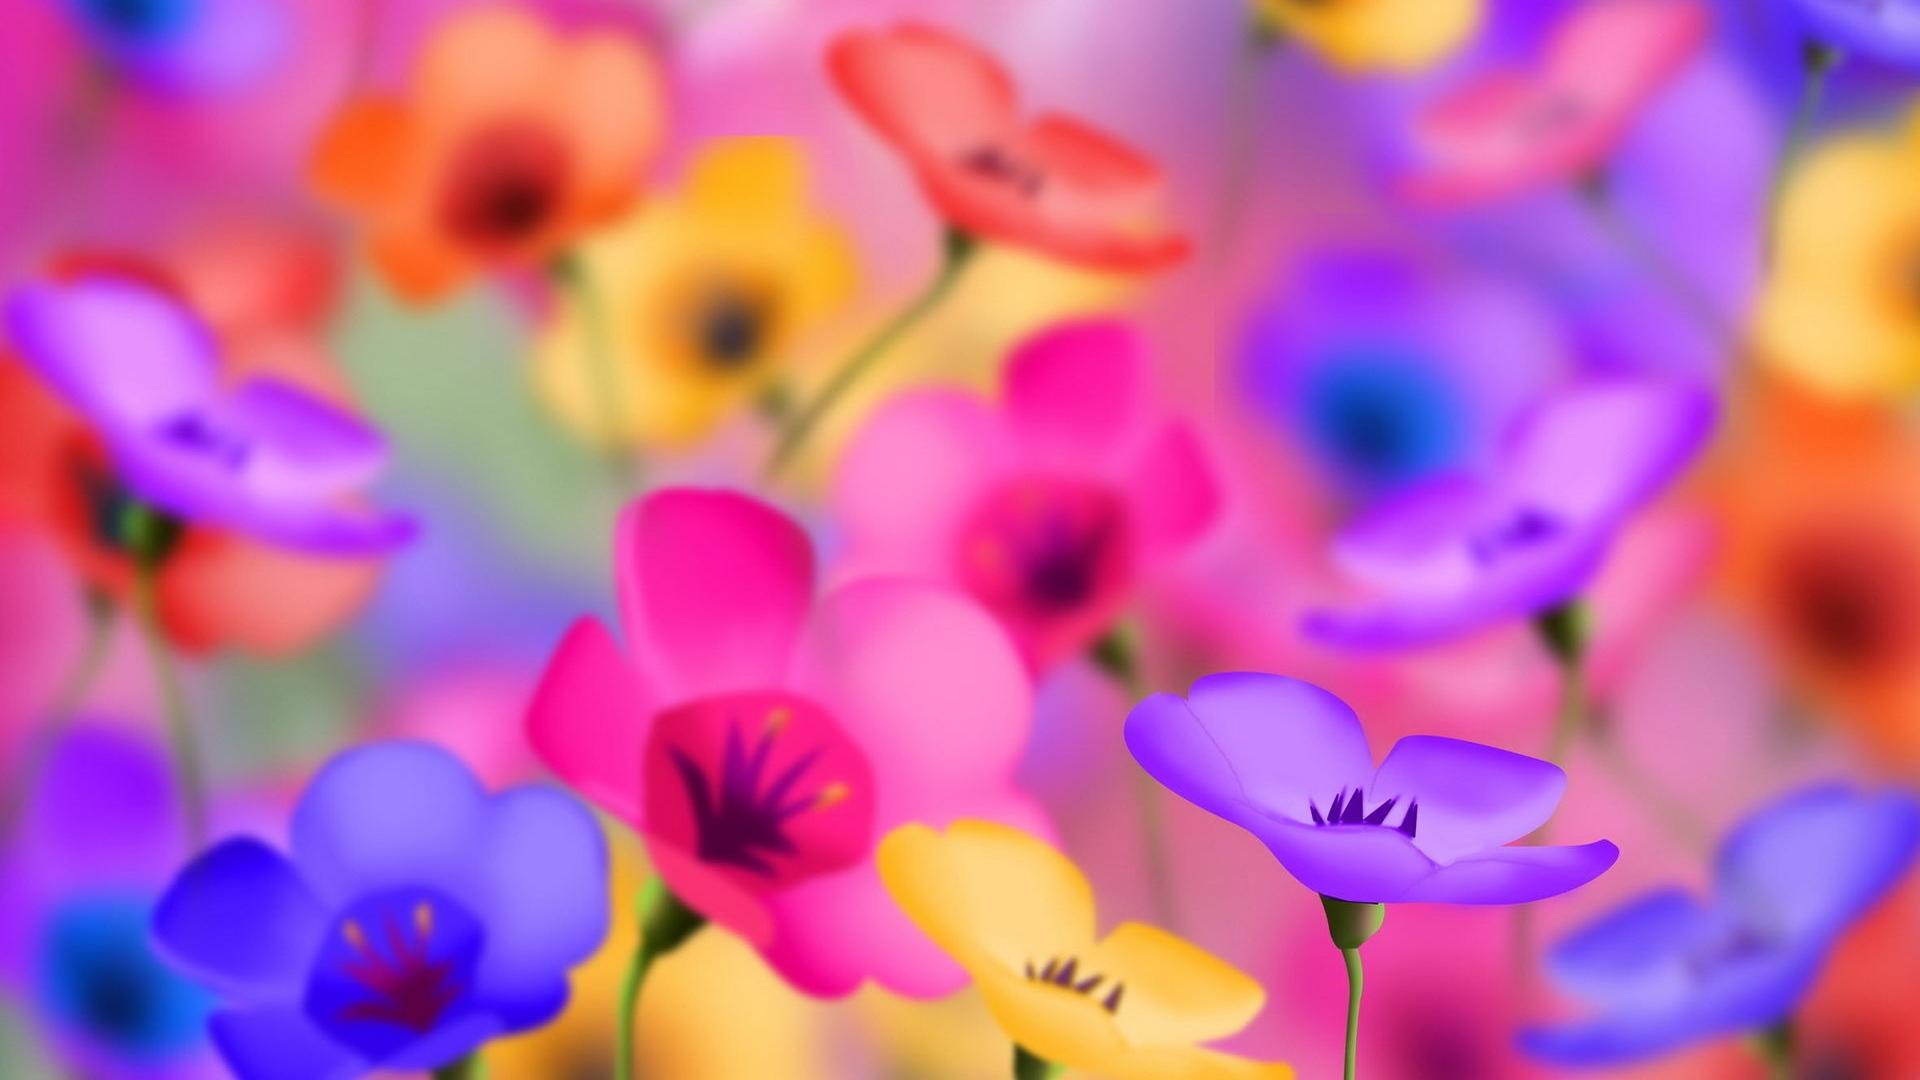 Full Hd Flower Wallpapers   wallpaper 1920x1080